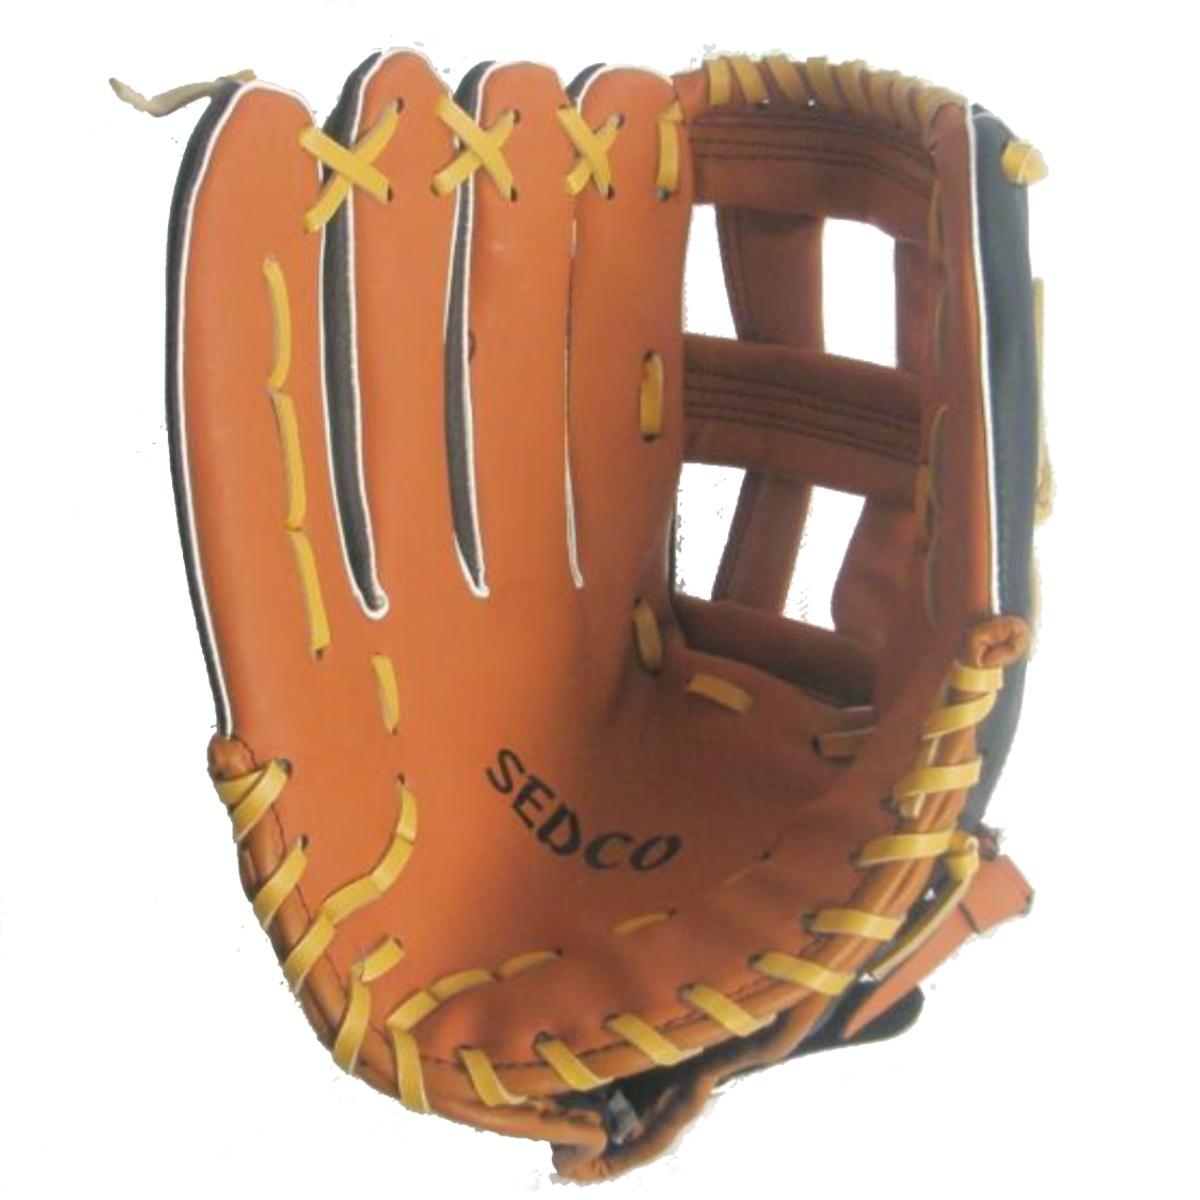 "Baseball rukavice pravá - vel. 13"""